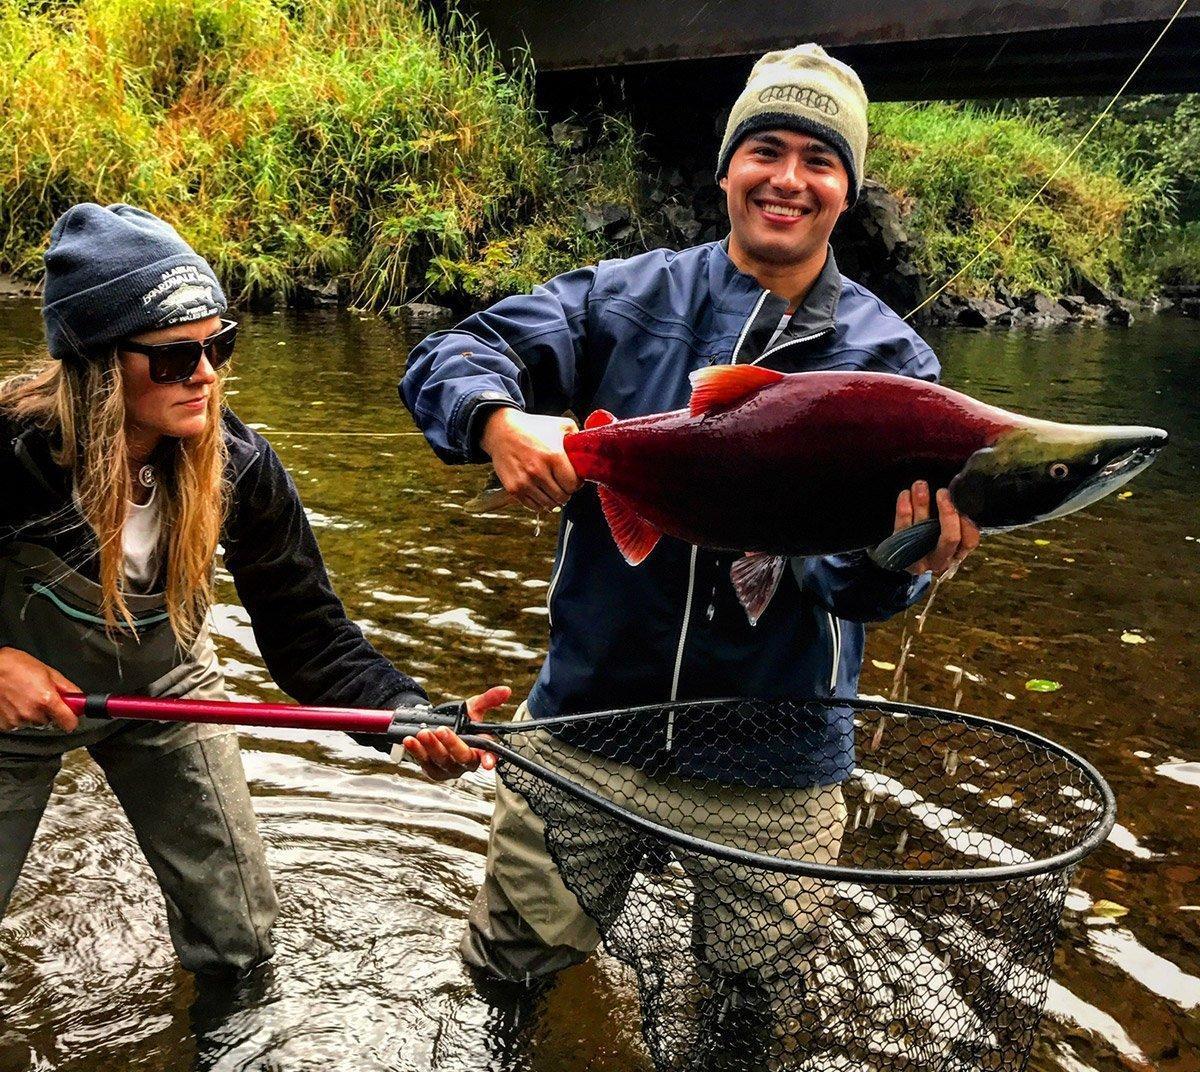 Orvis guide Kris Atkins nets sockeye salmon